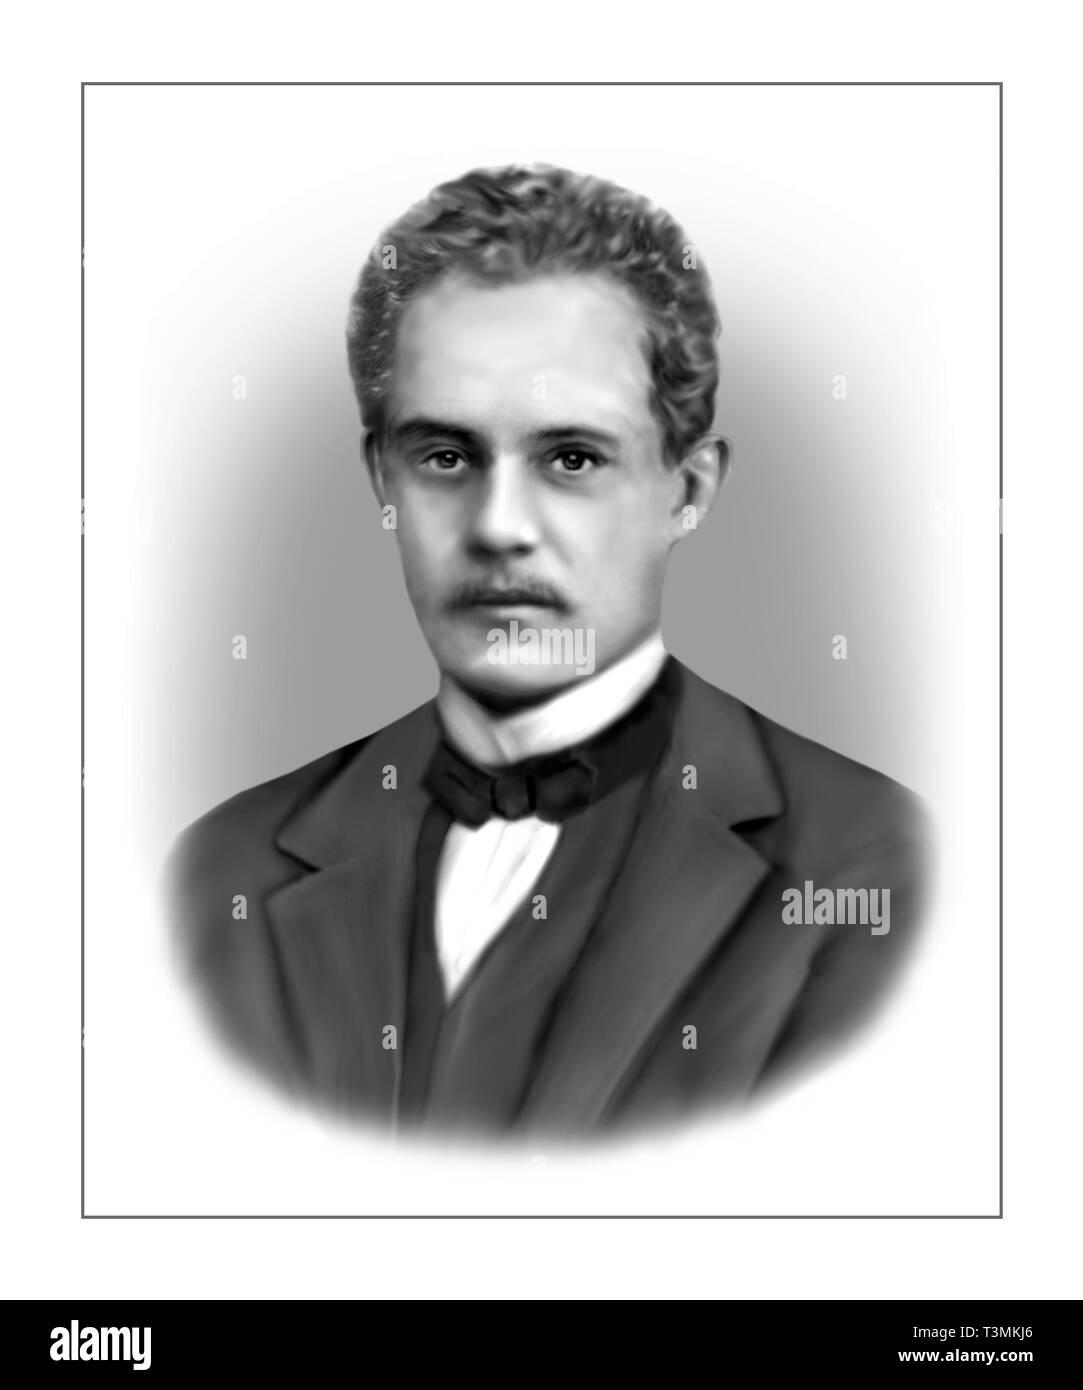 Arnold Sommerfeld 1868-1951 físico teórico alemán Foto de stock